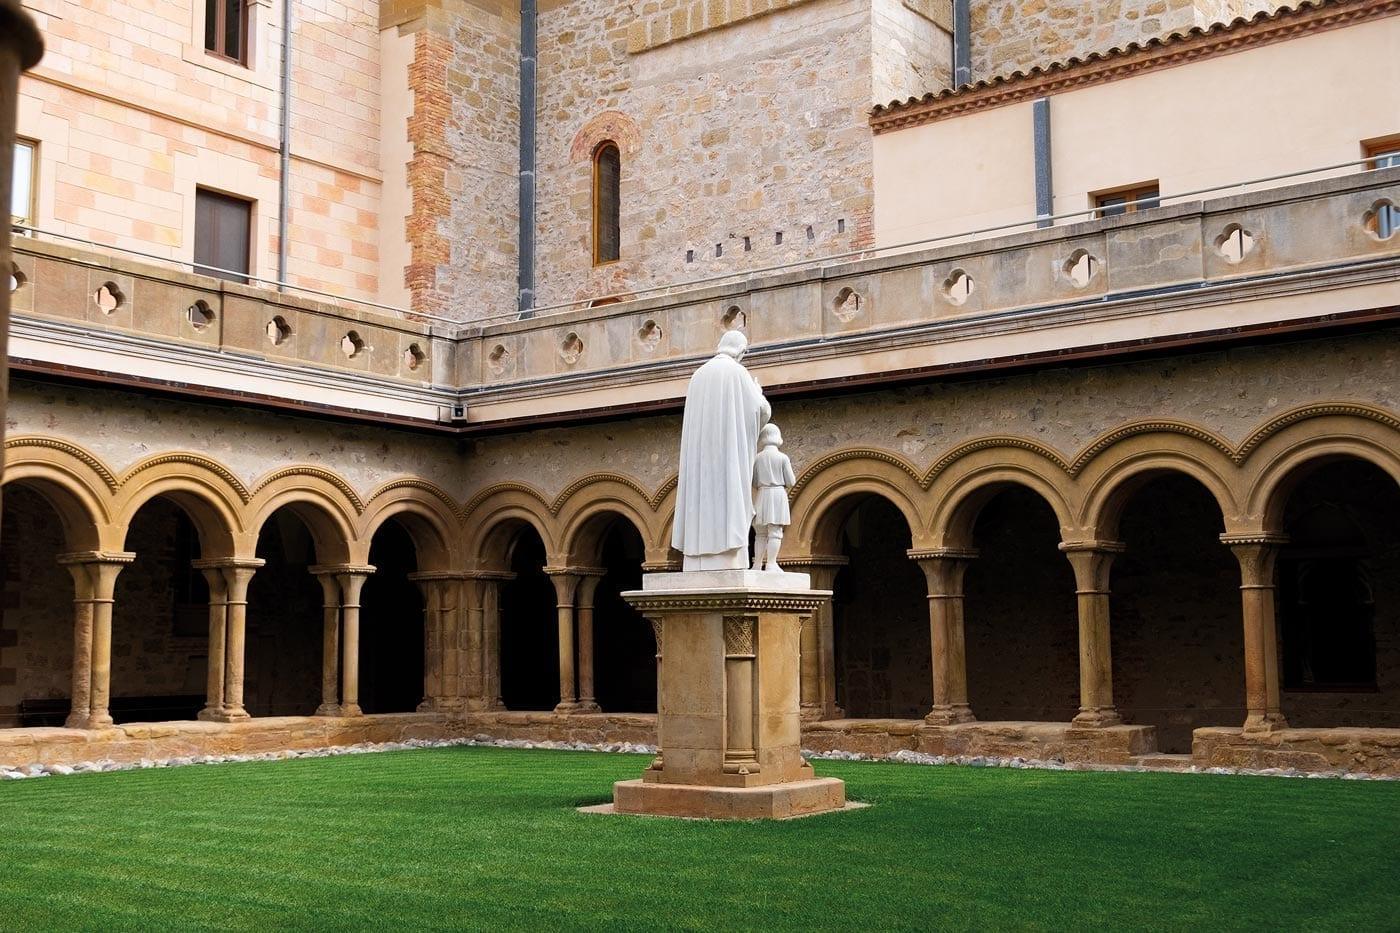 Kreuzgang, Monastir de Santa maria Bellpuig Avellanes,  katalonien